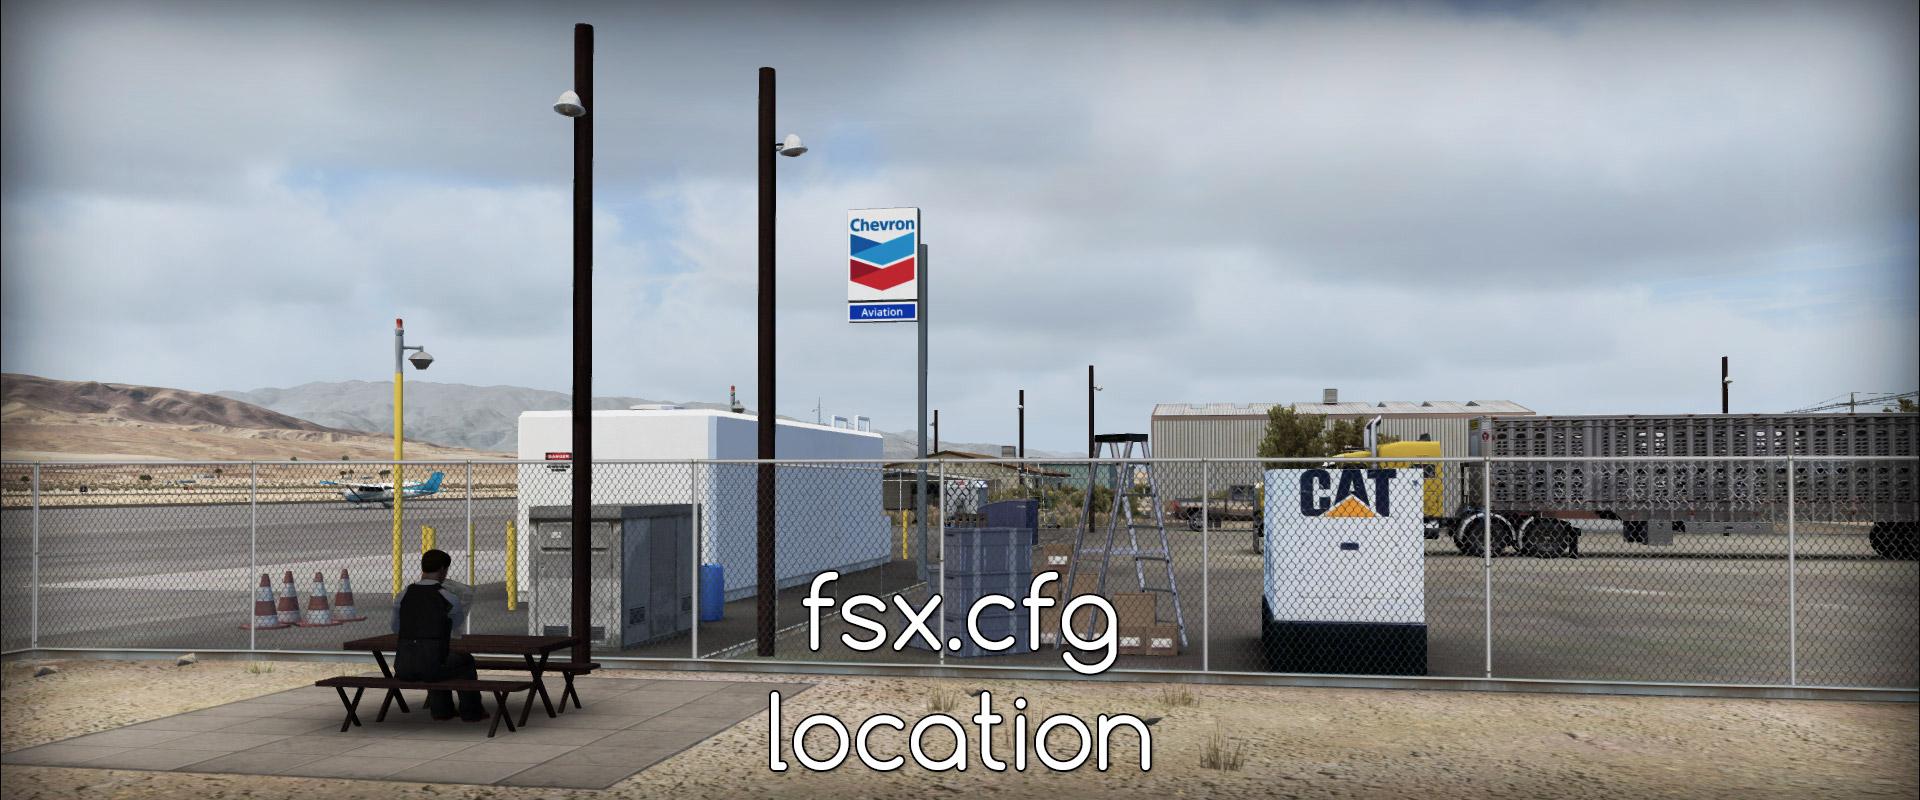 fsx.cfg location